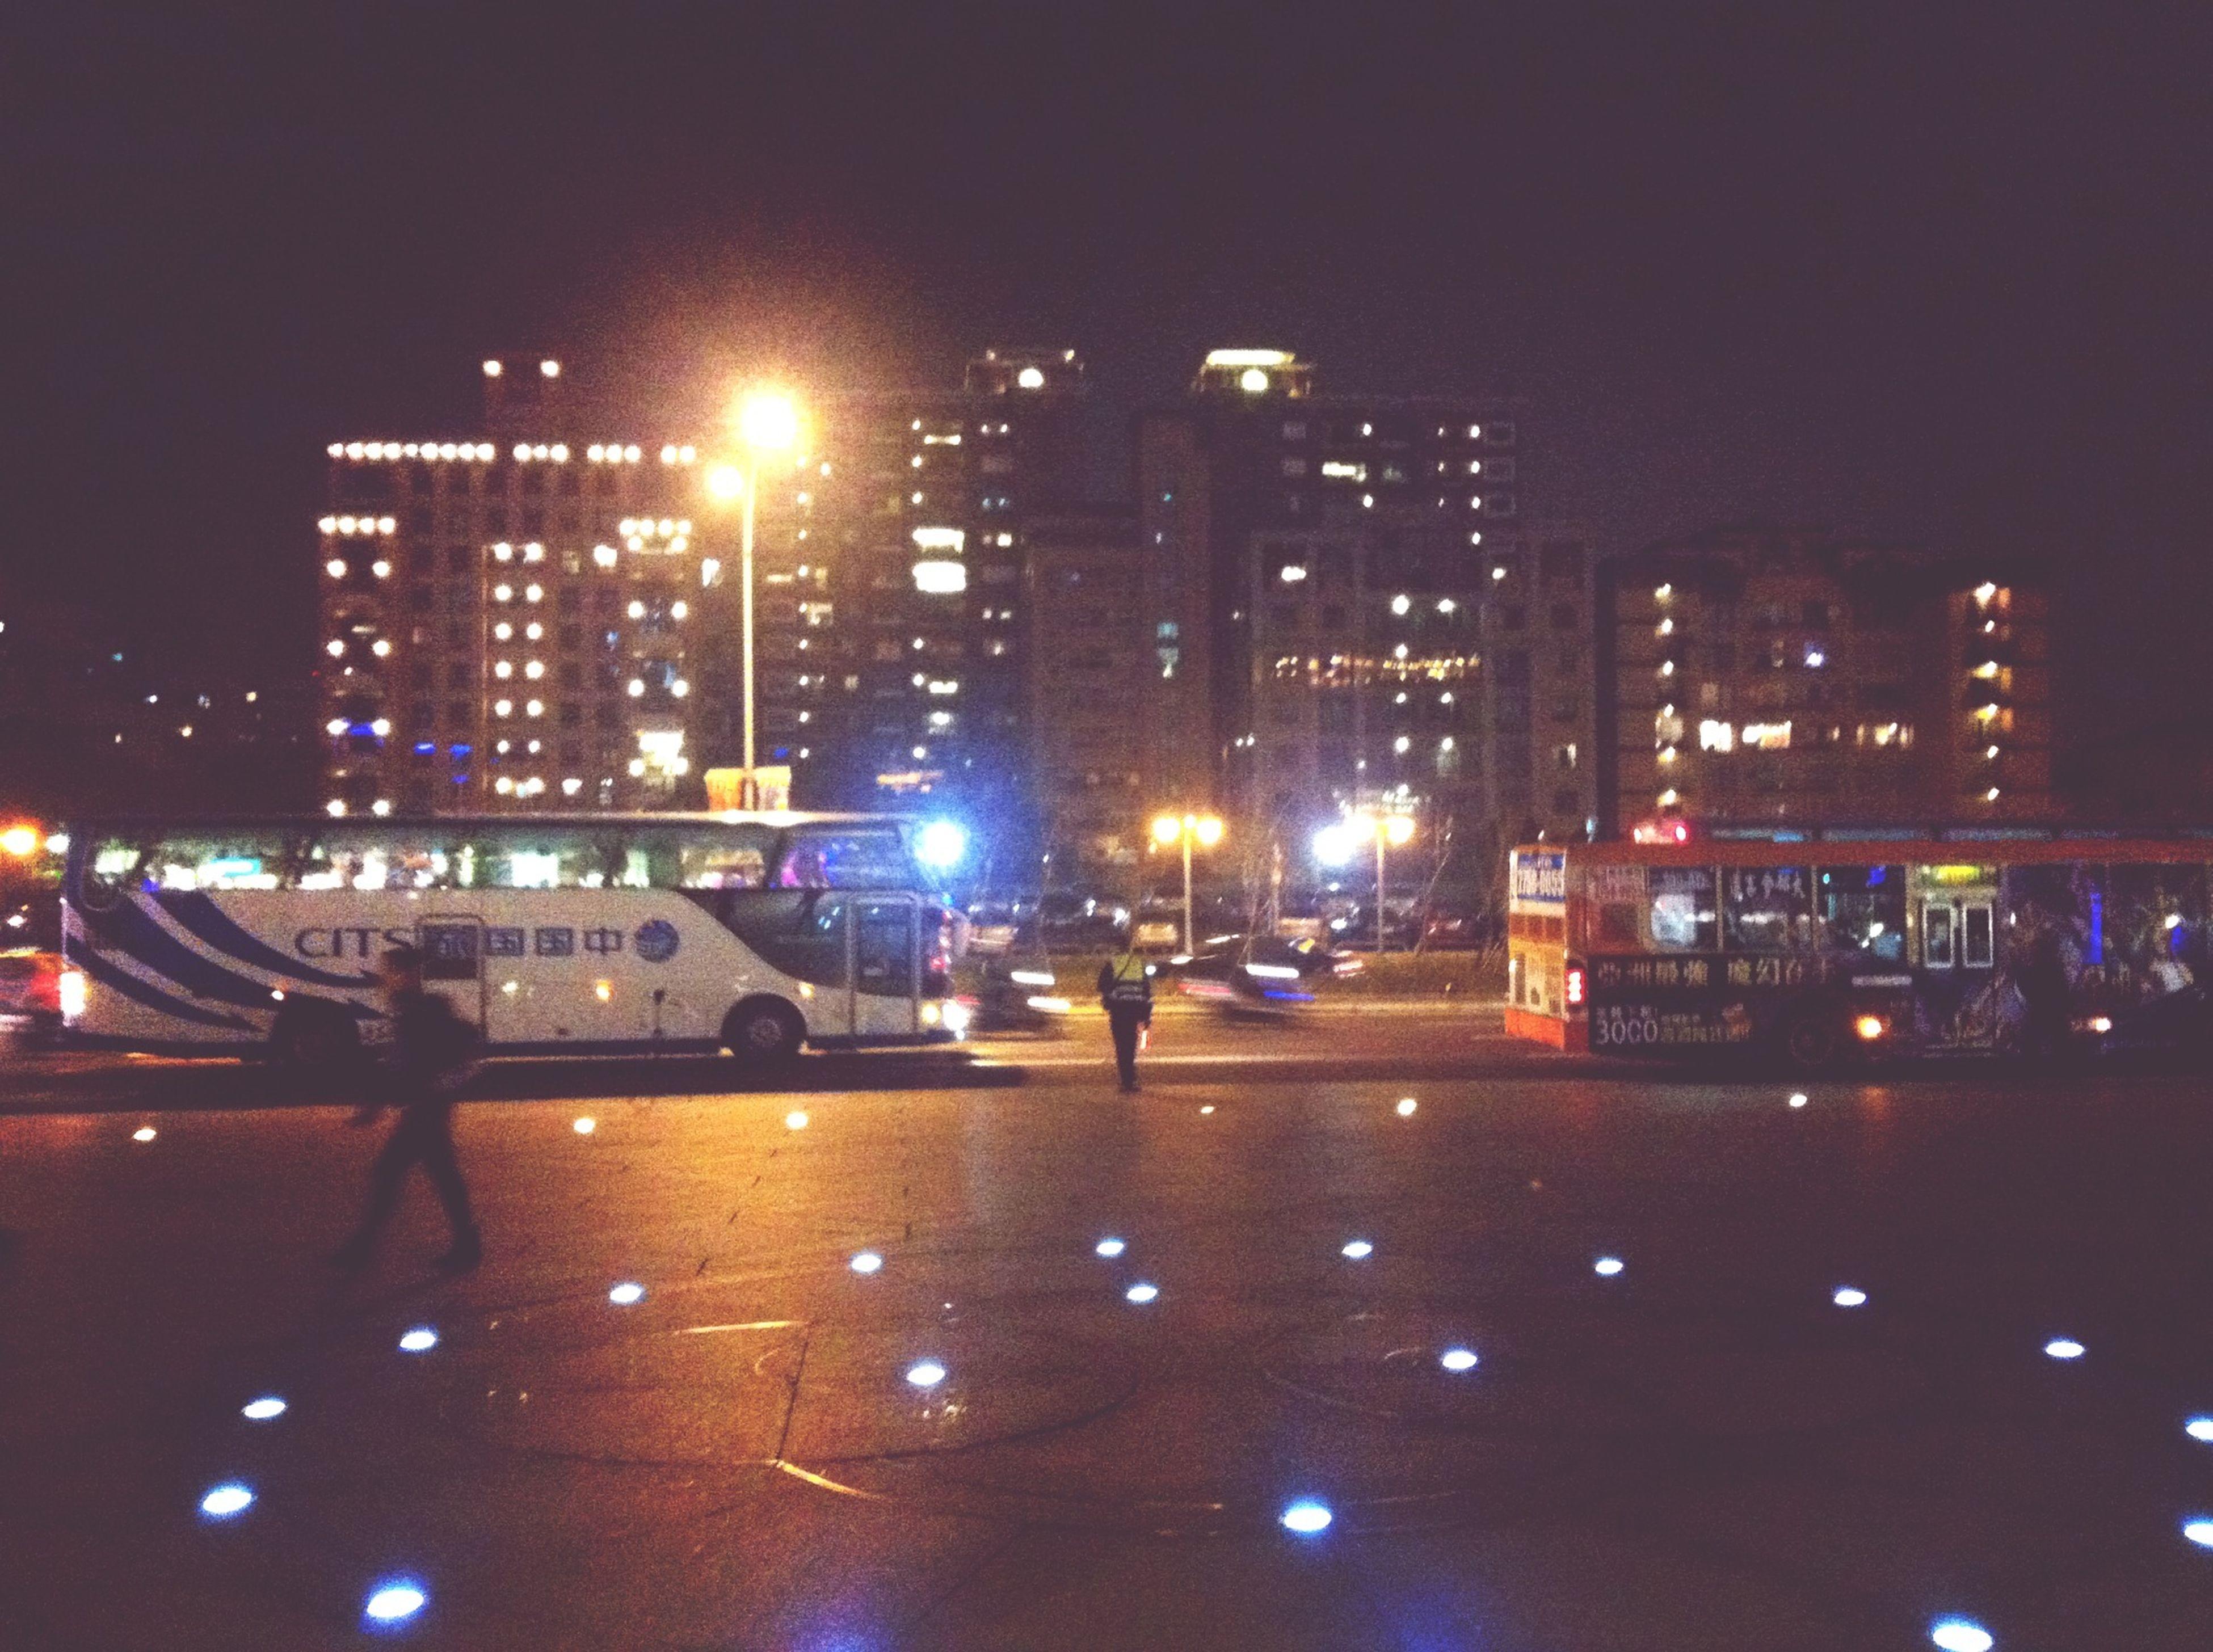 illuminated, building exterior, architecture, city, night, built structure, transportation, street light, skyscraper, mode of transport, cityscape, city life, car, office building, modern, land vehicle, street, city street, lighting equipment, tall - high